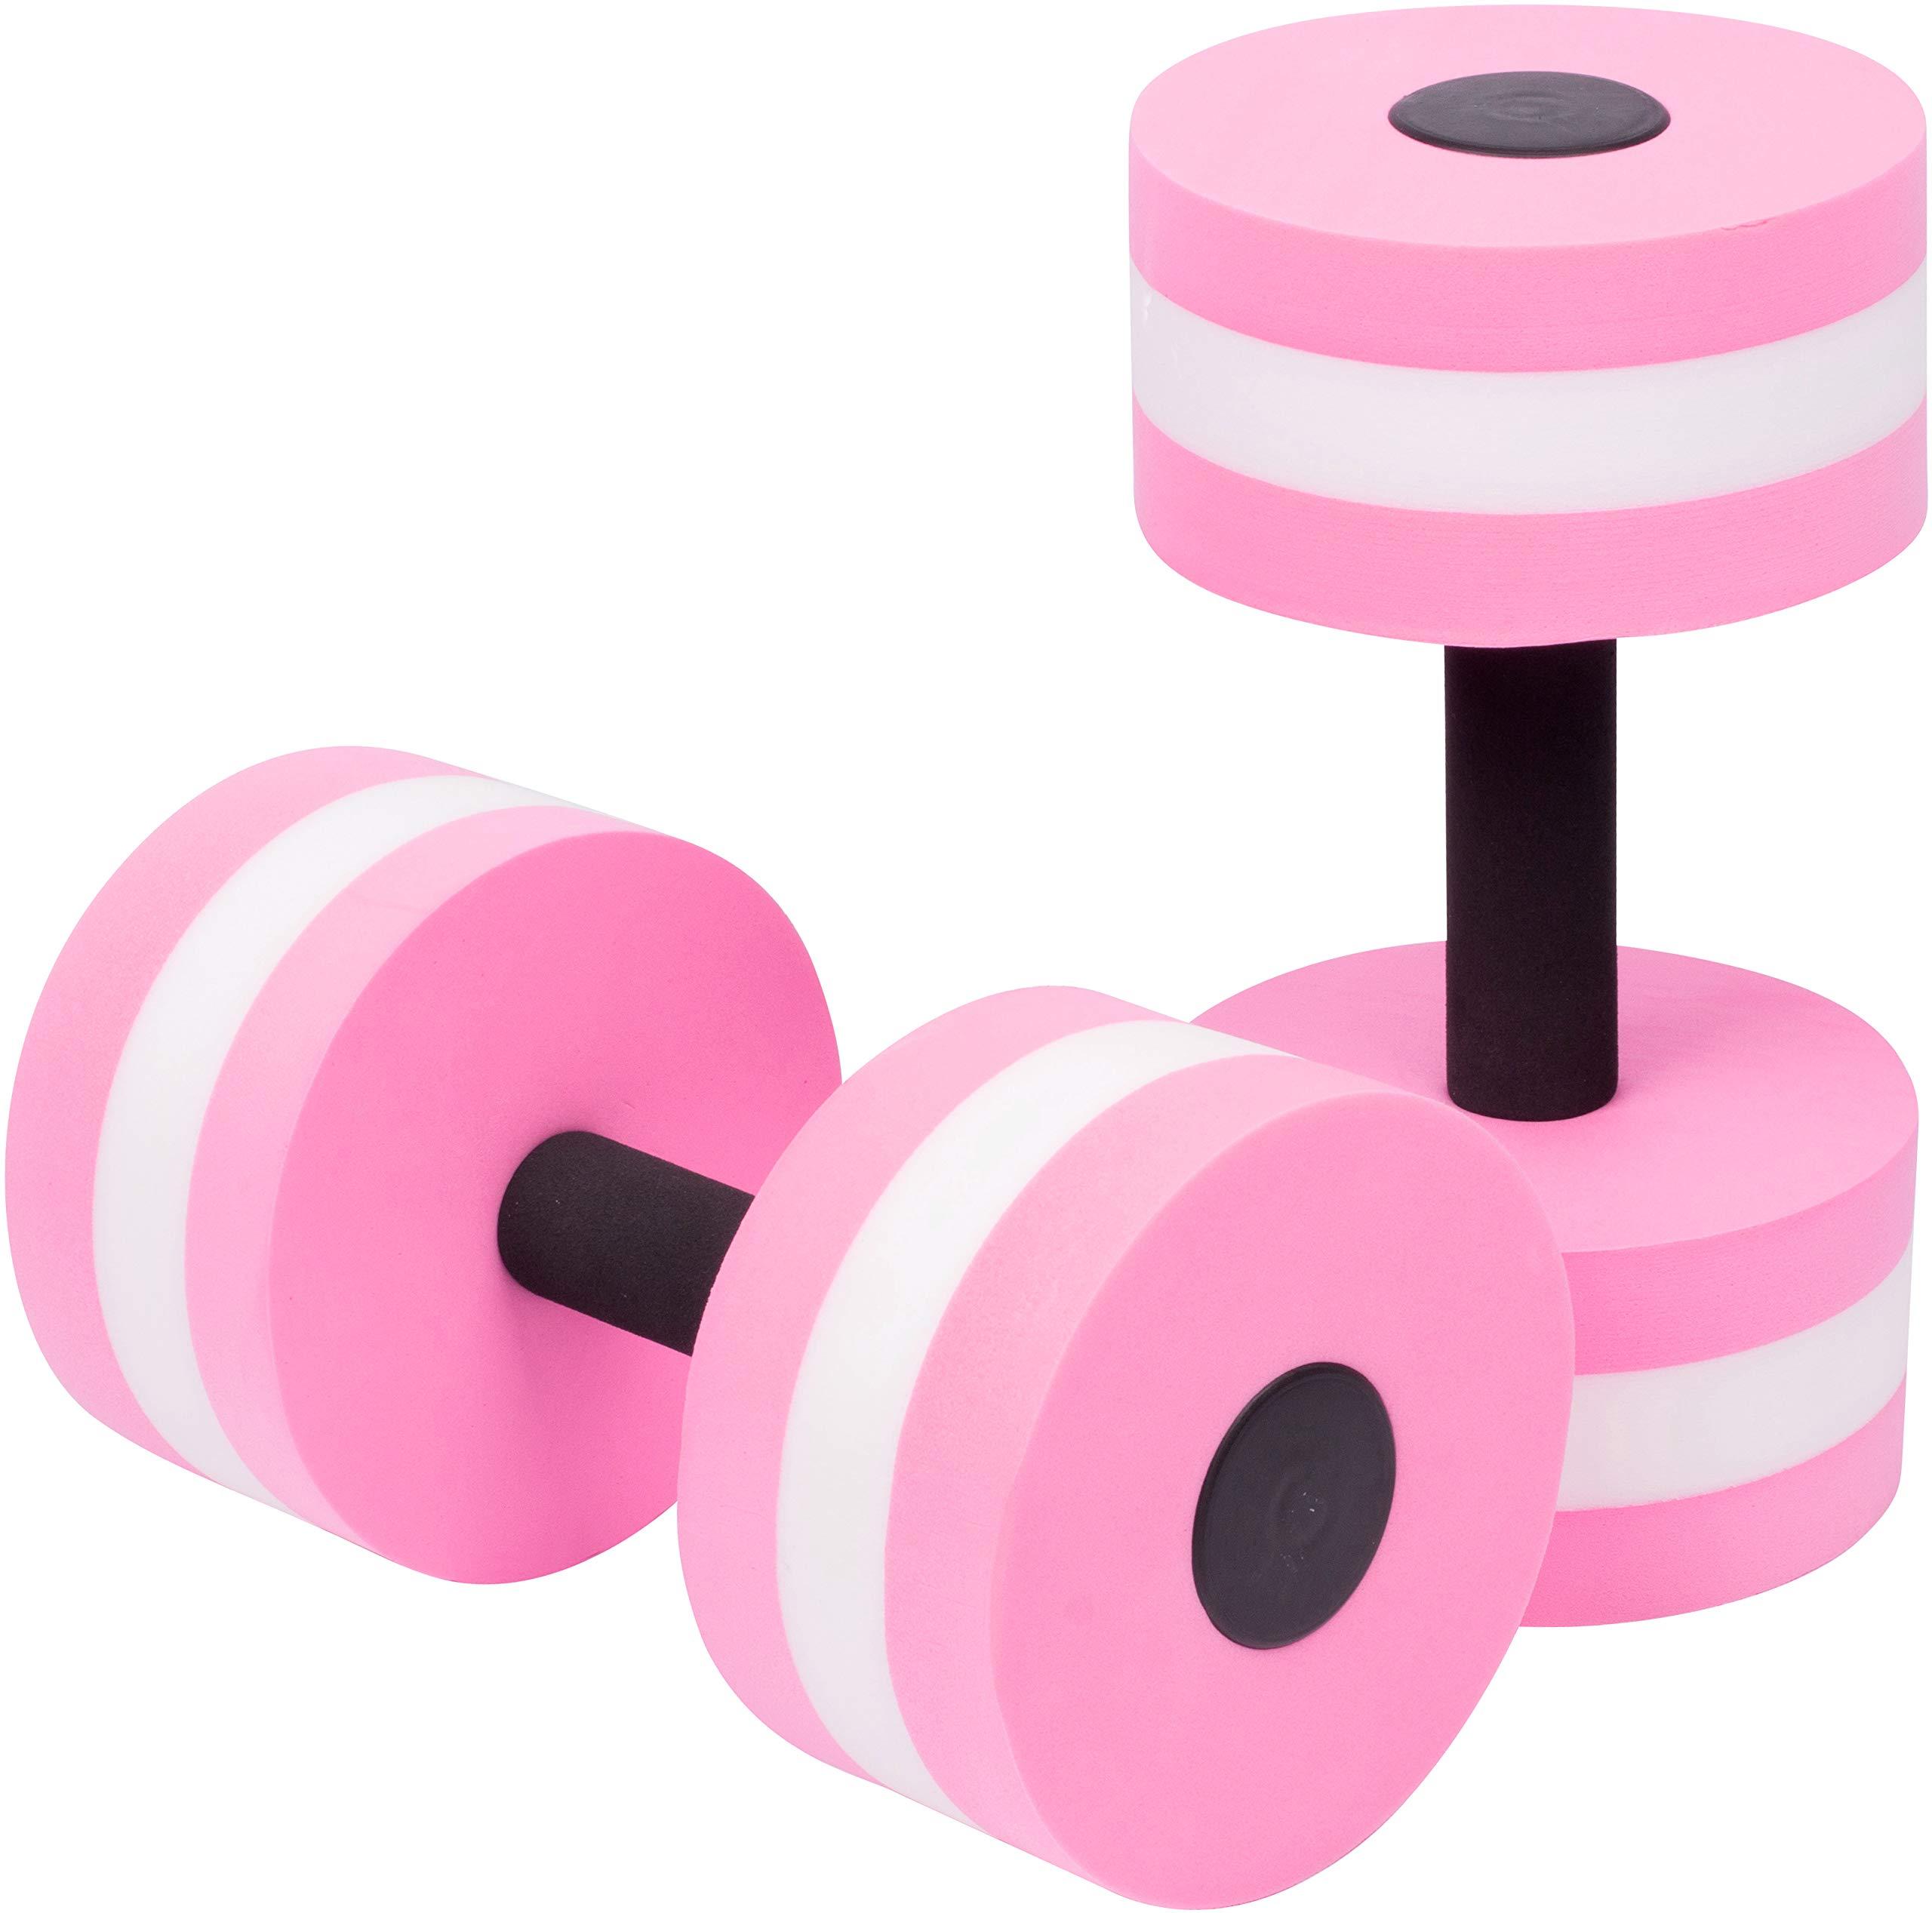 Trademark Innovations Aquatic Exercise Dumbells - Set of 2 - for Water Aerobics (Dark Pink)